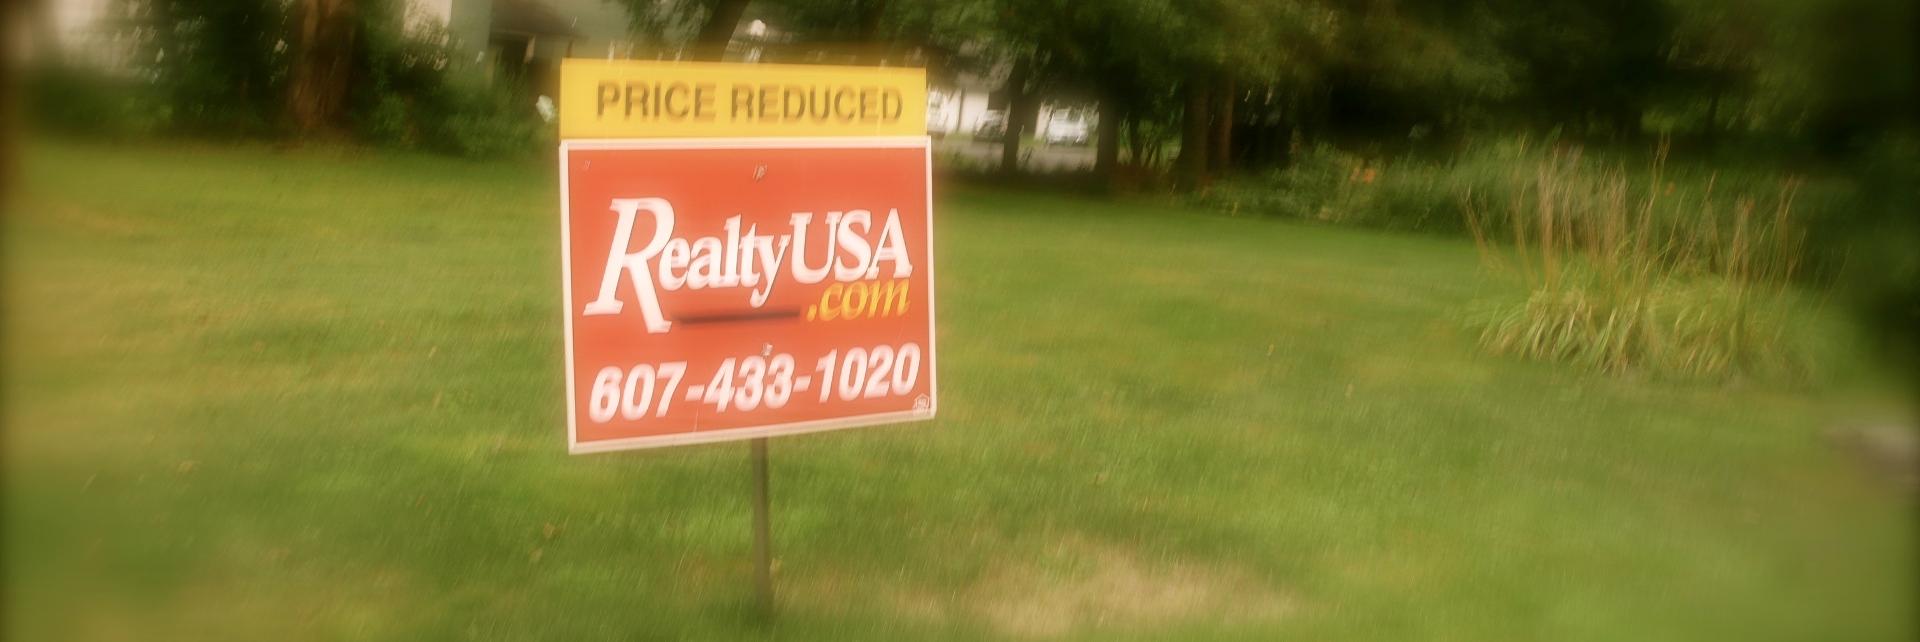 verdad reduced price